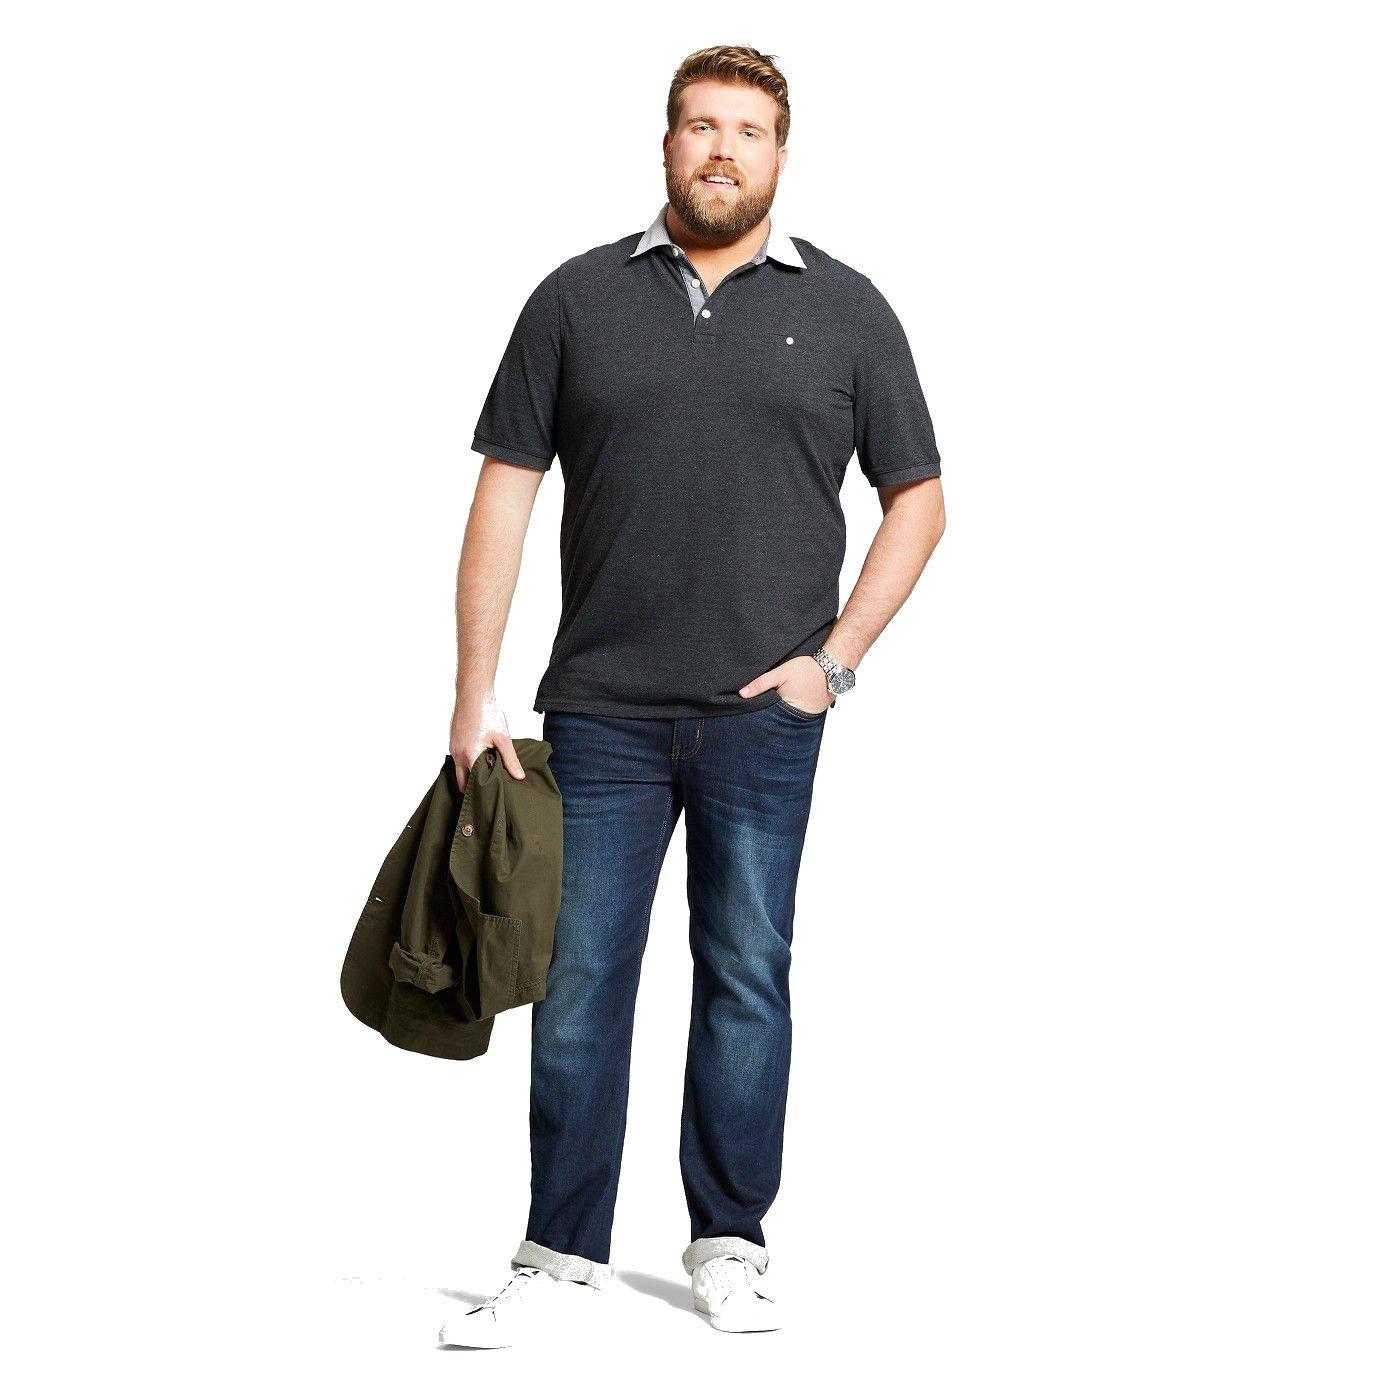 24124c0314c Goodfellow & Co Men's Big & Tall Short Sleeve Polo Shirt, Black, 5 XBT at  Amazon Men's Clothing store: